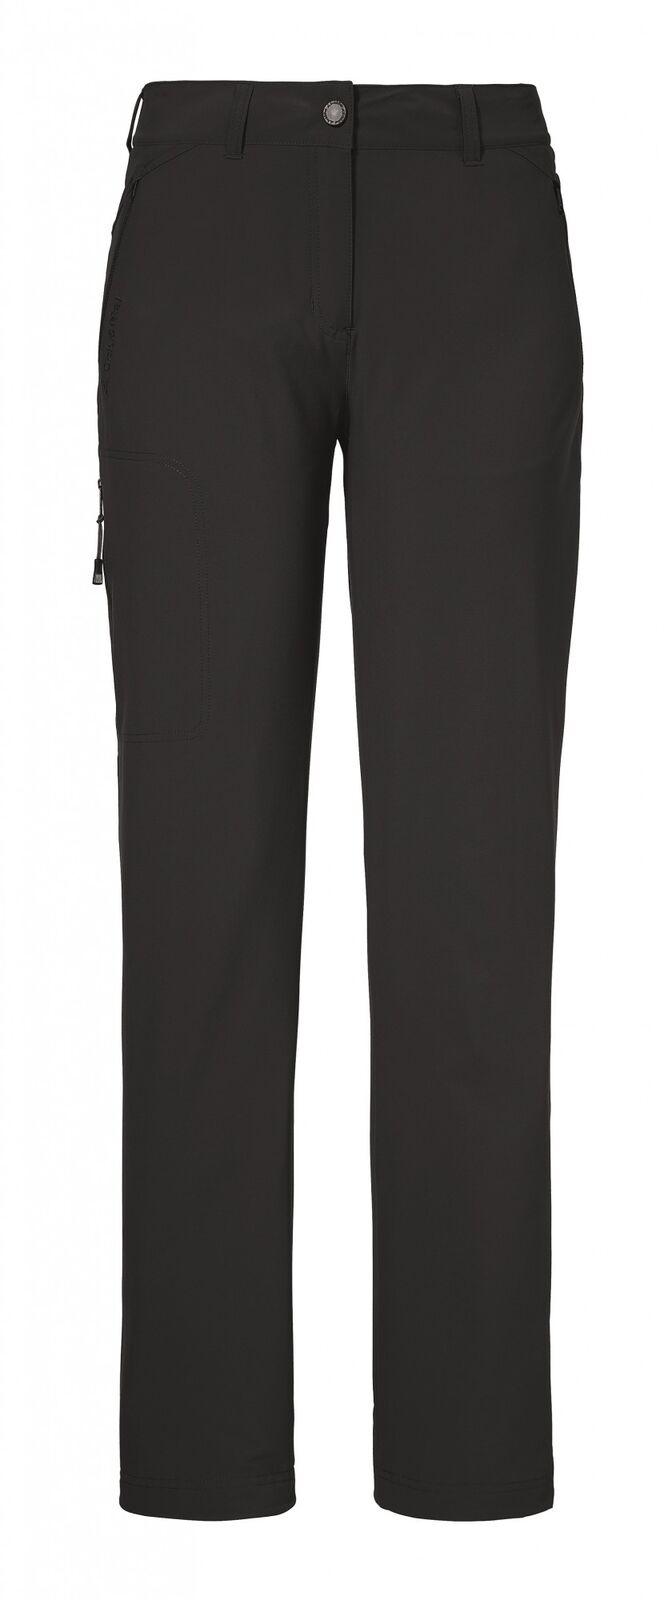 Schöffel LISBONA donna pantaloni invernali Pantaloni escursionismo Outdoor